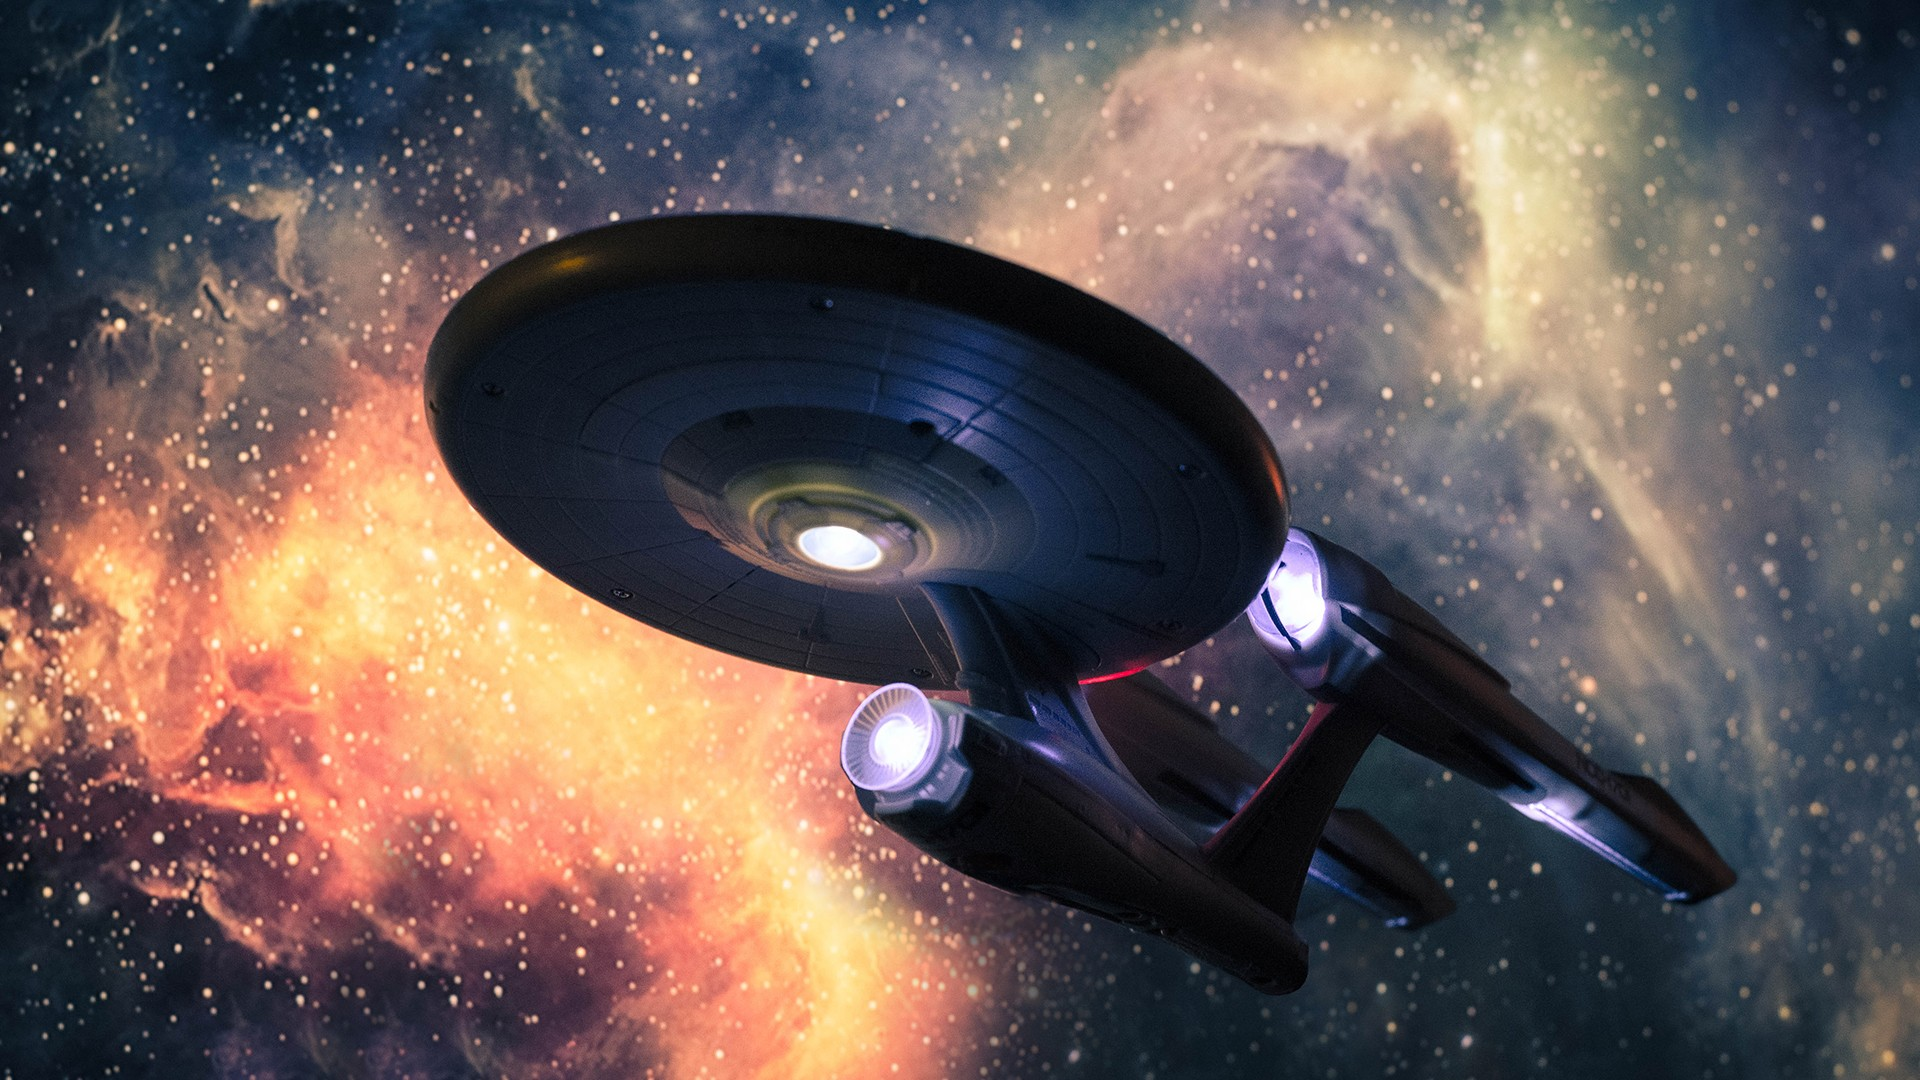 Star Trek The Original Series Hd Wallpaper Background